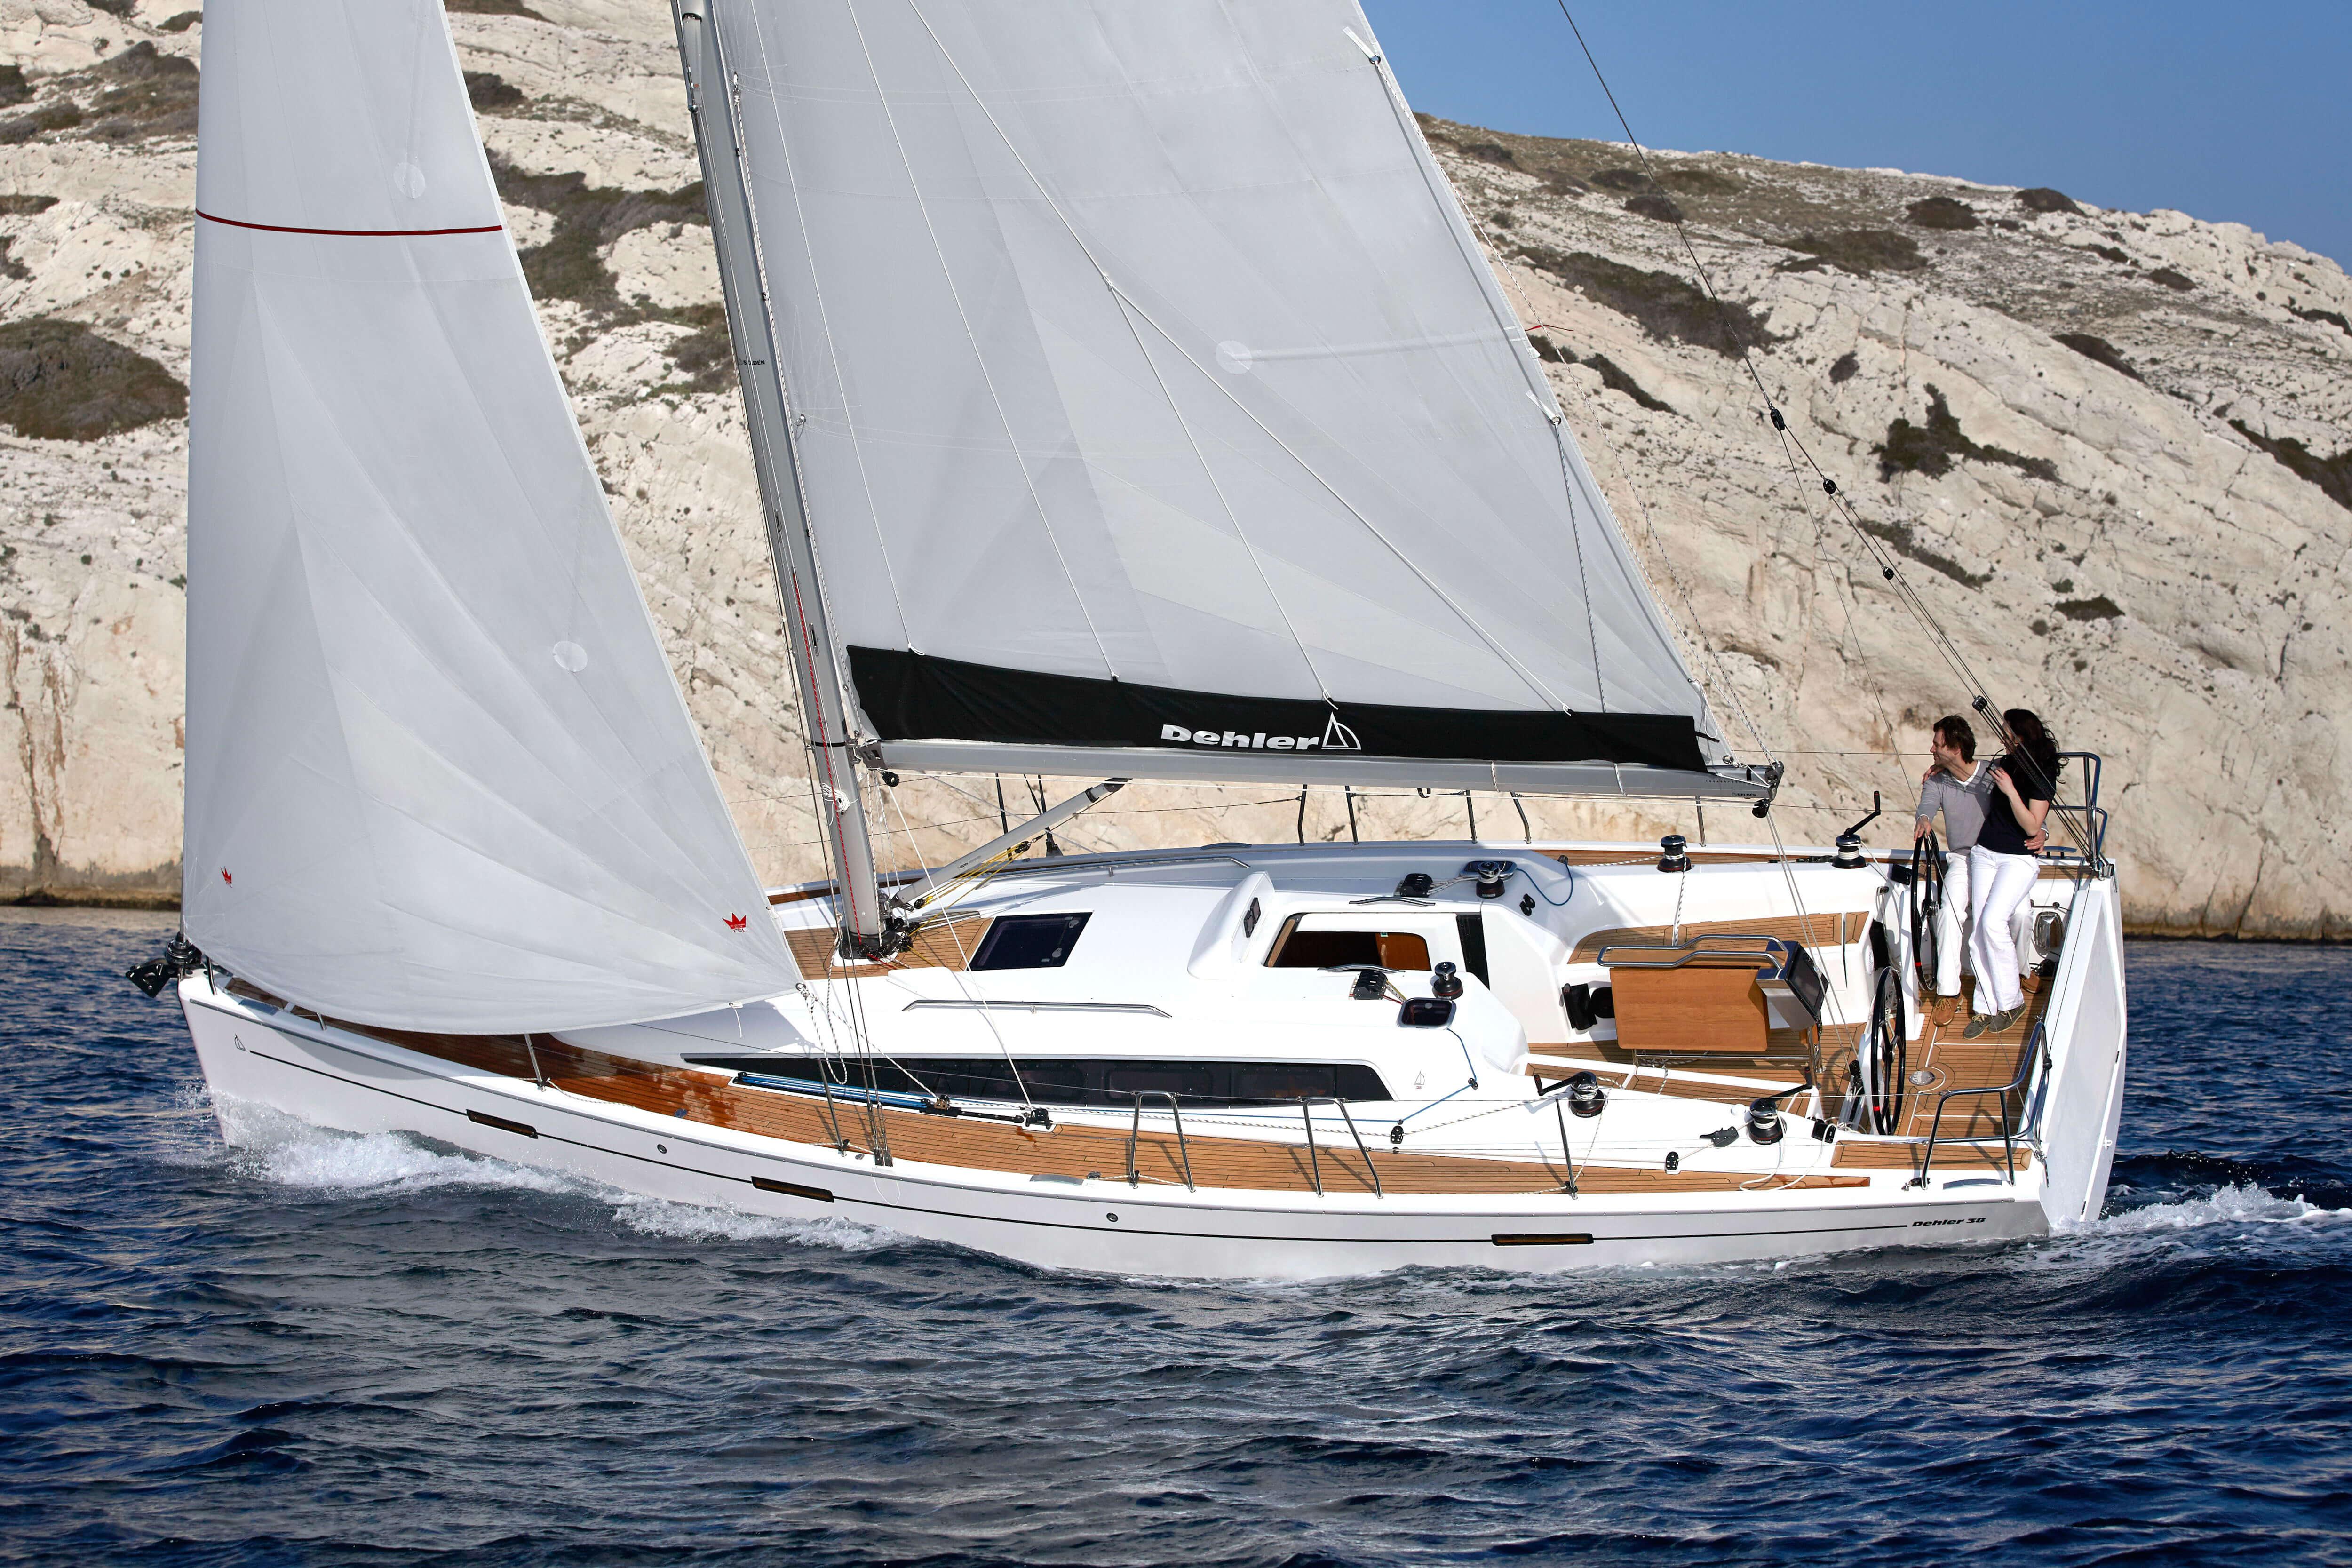 Dehler 38 Exterior Sailing | mainsail, foresail, teak deck, cockpit | Dehler